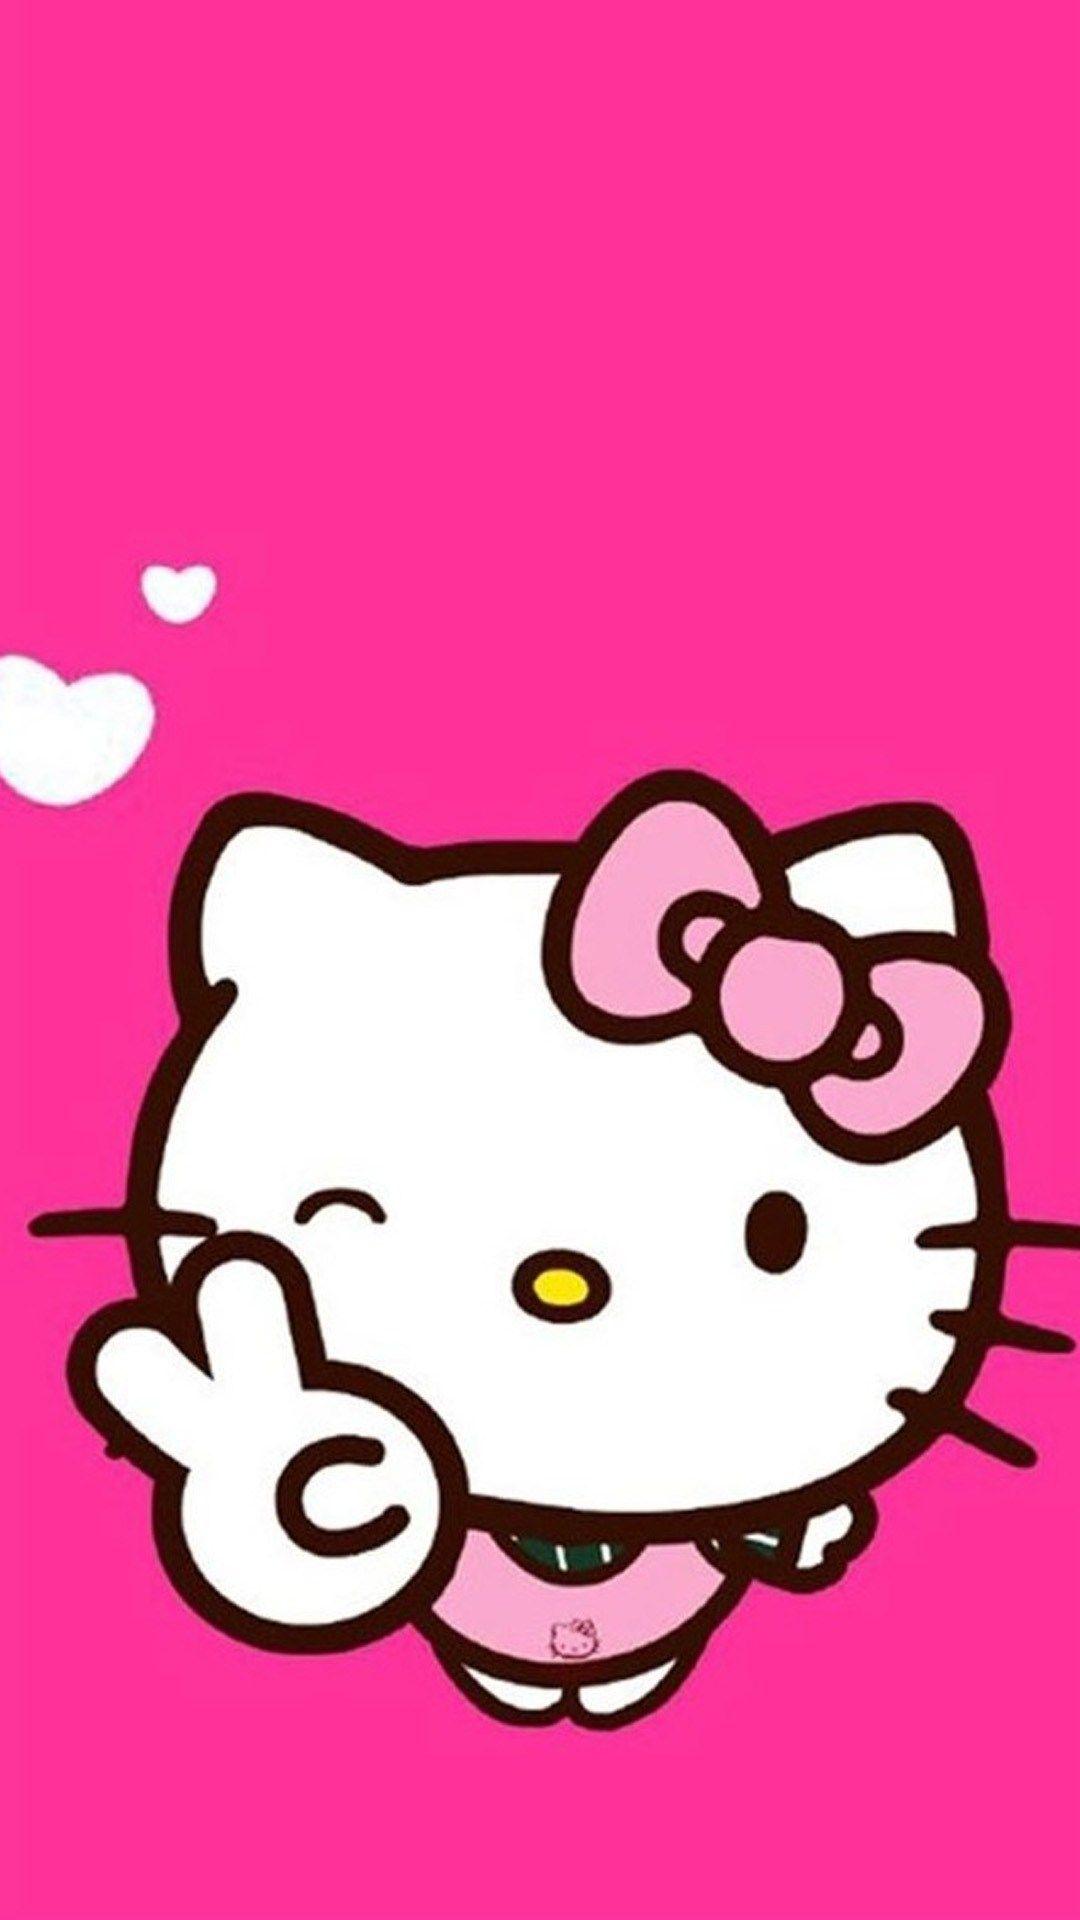 خلفيات موبايل للبنات Tecnologis Hello Kitty Backgrounds Hello Kitty Wallpaper Hd Hello Kitty Images